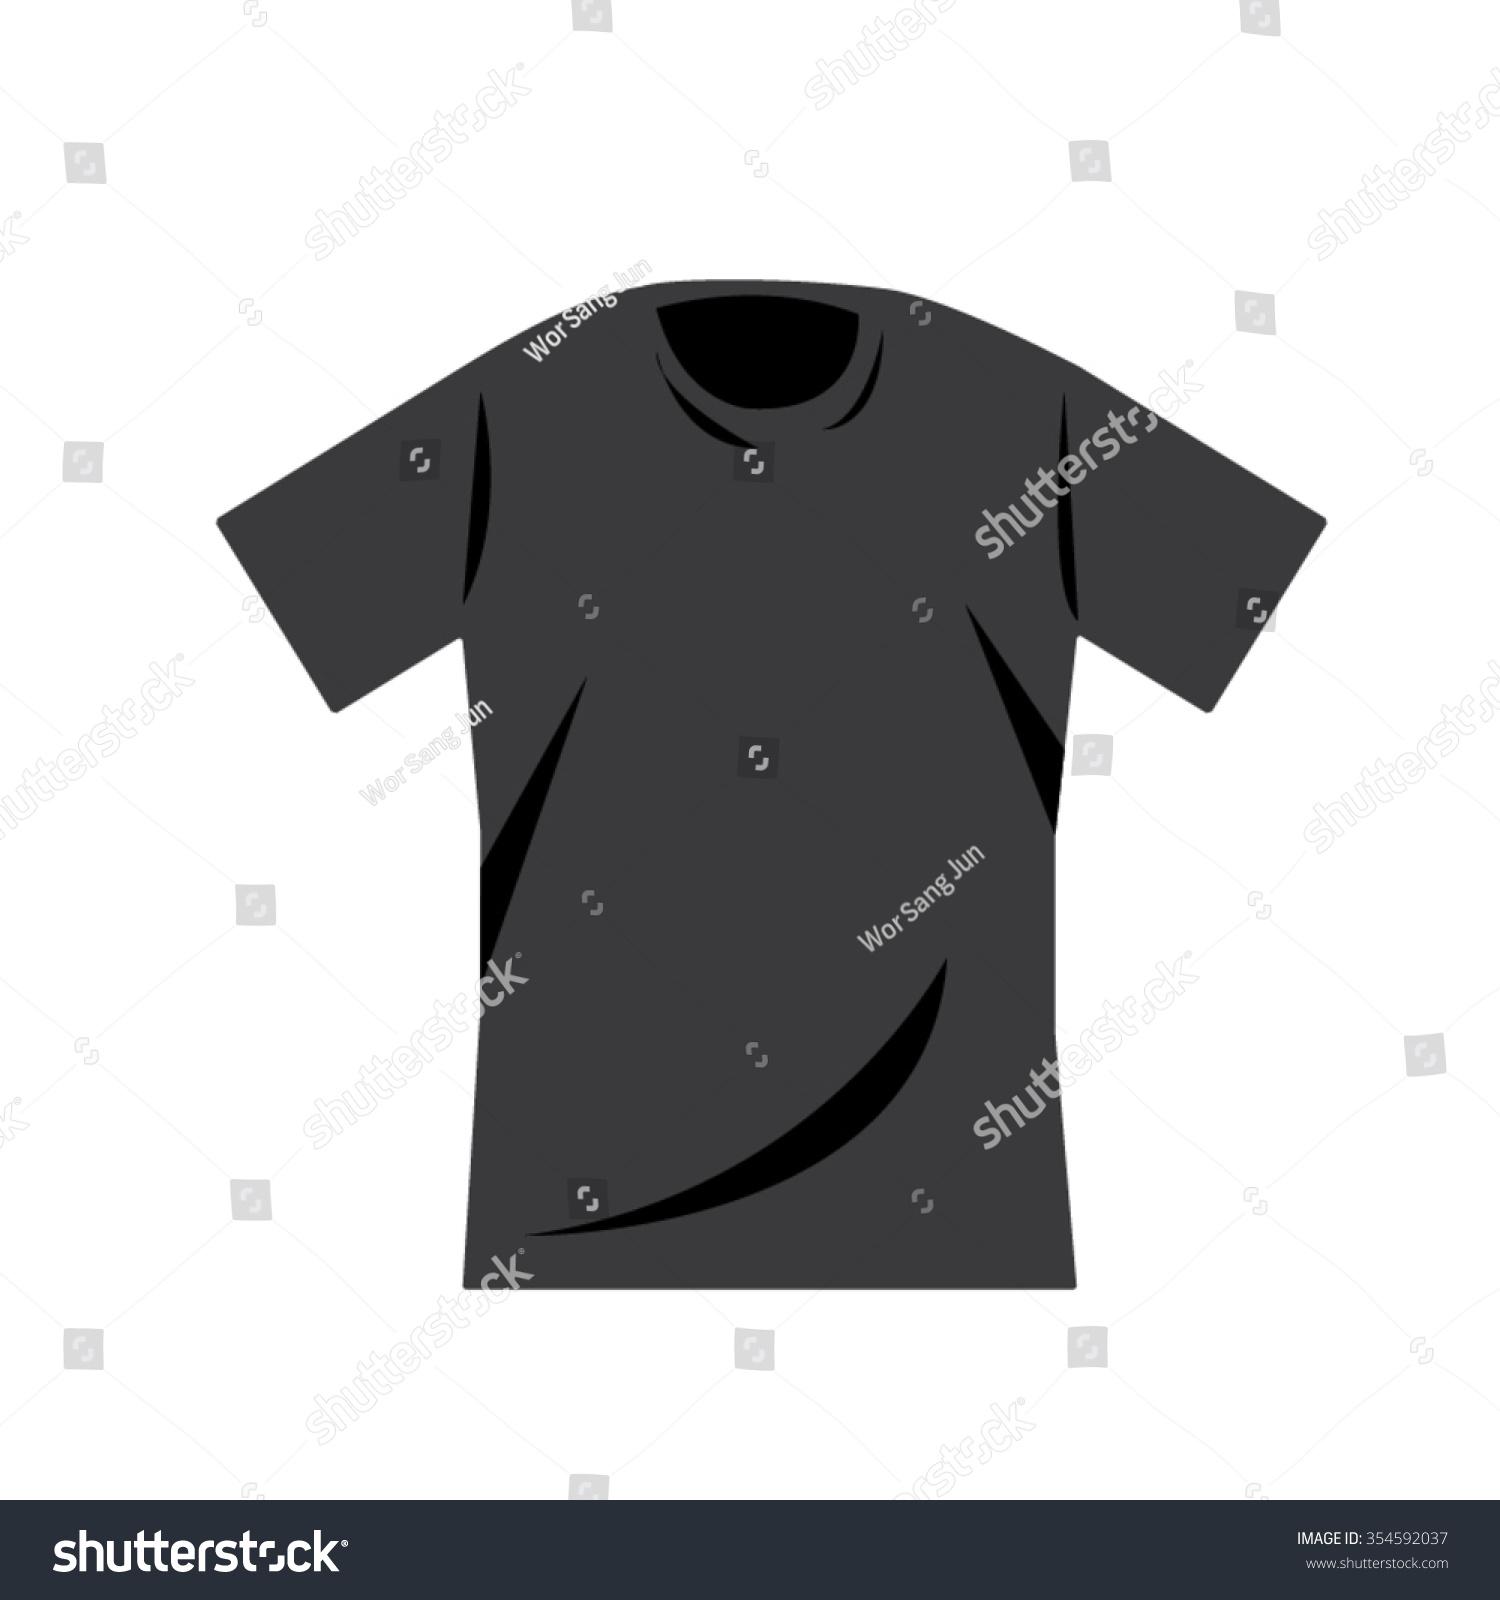 Black t shirt vector photoshop - Black T Shirt Vector